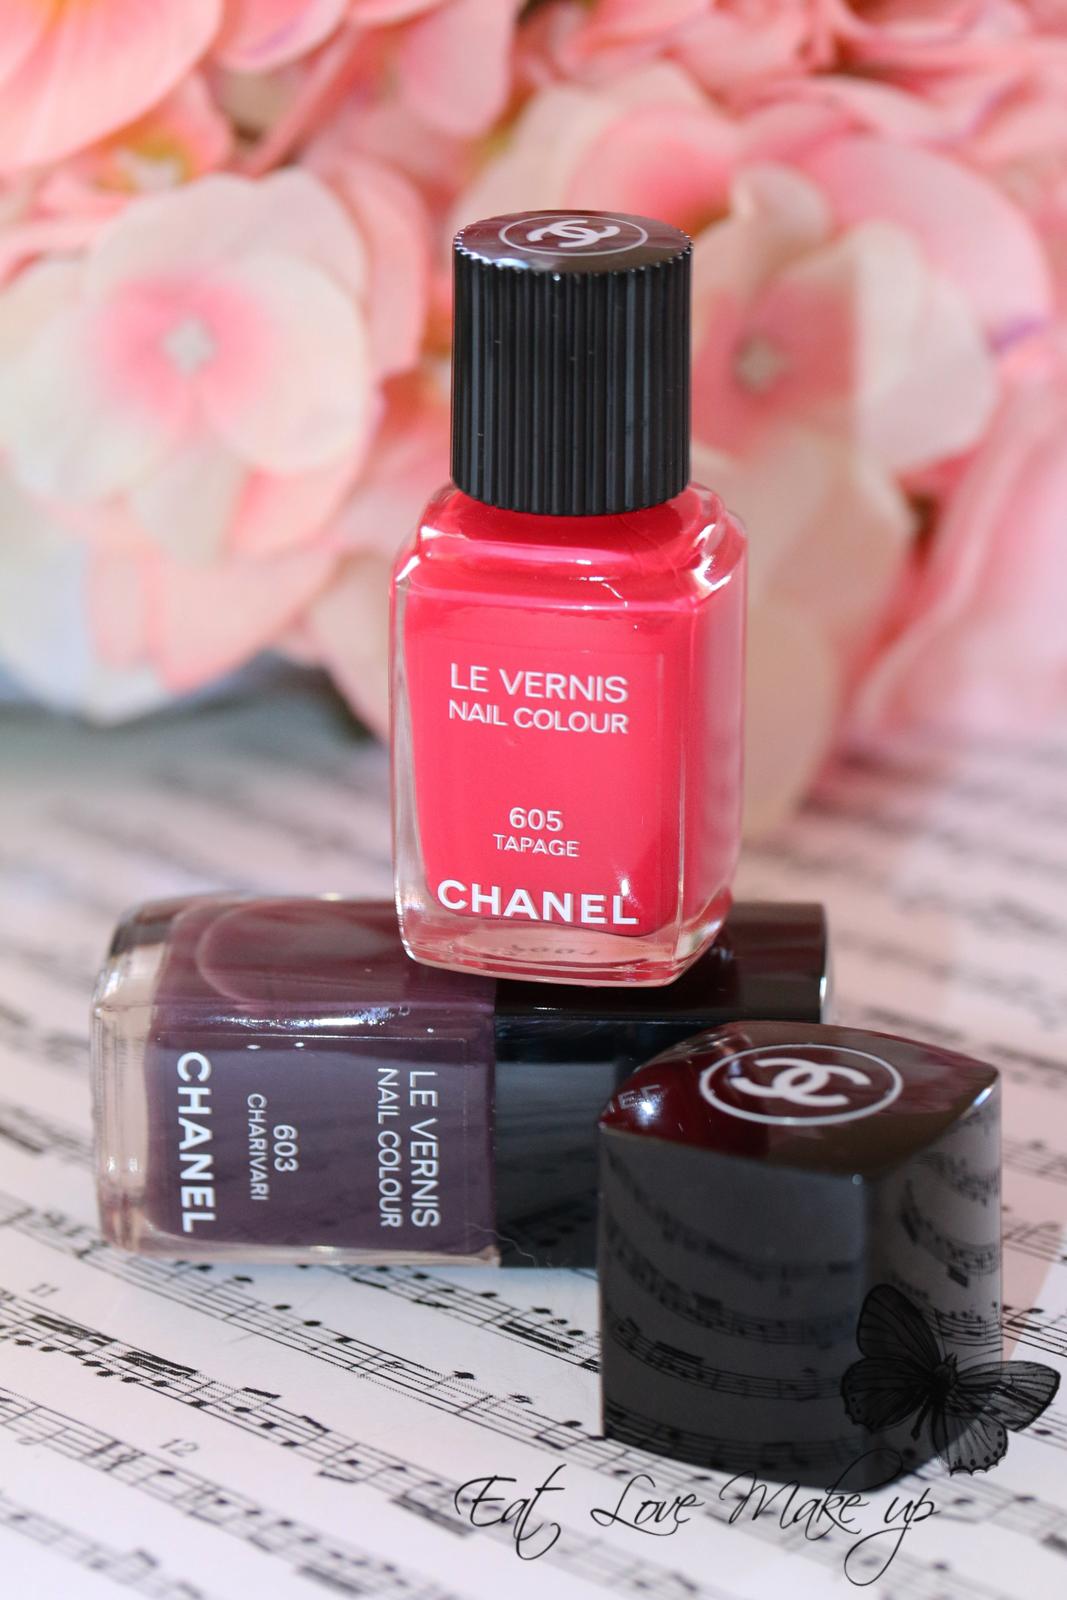 Chanel Le Vernis Nail Colour 603 Charivari & 605 Tapage